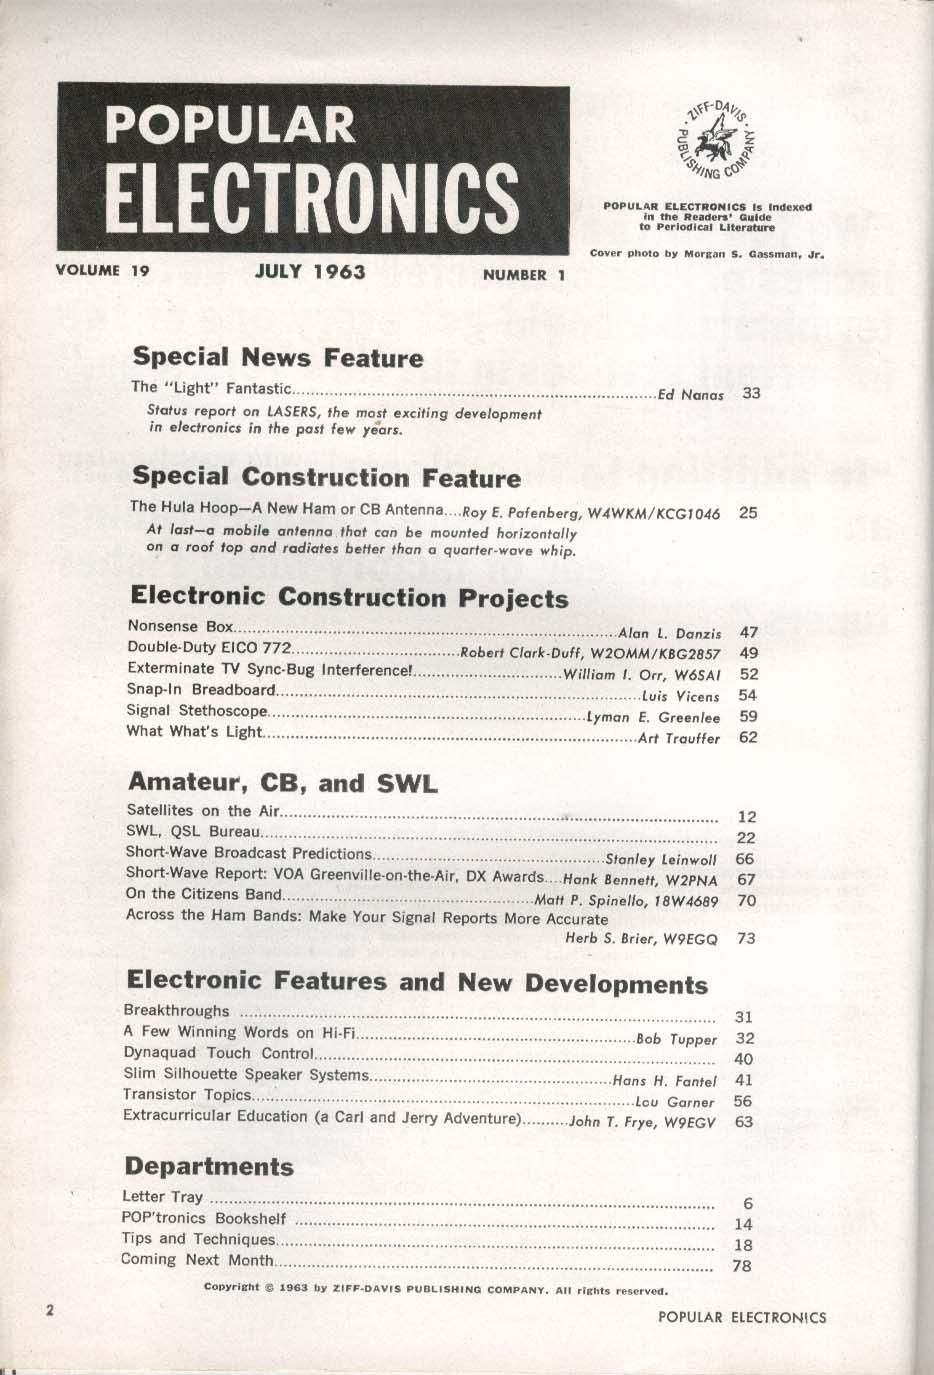 POPULAR ELECTRONICS Lasers Signal Stethoscope Hi-Fi Speakers RID AM TV 7 1963